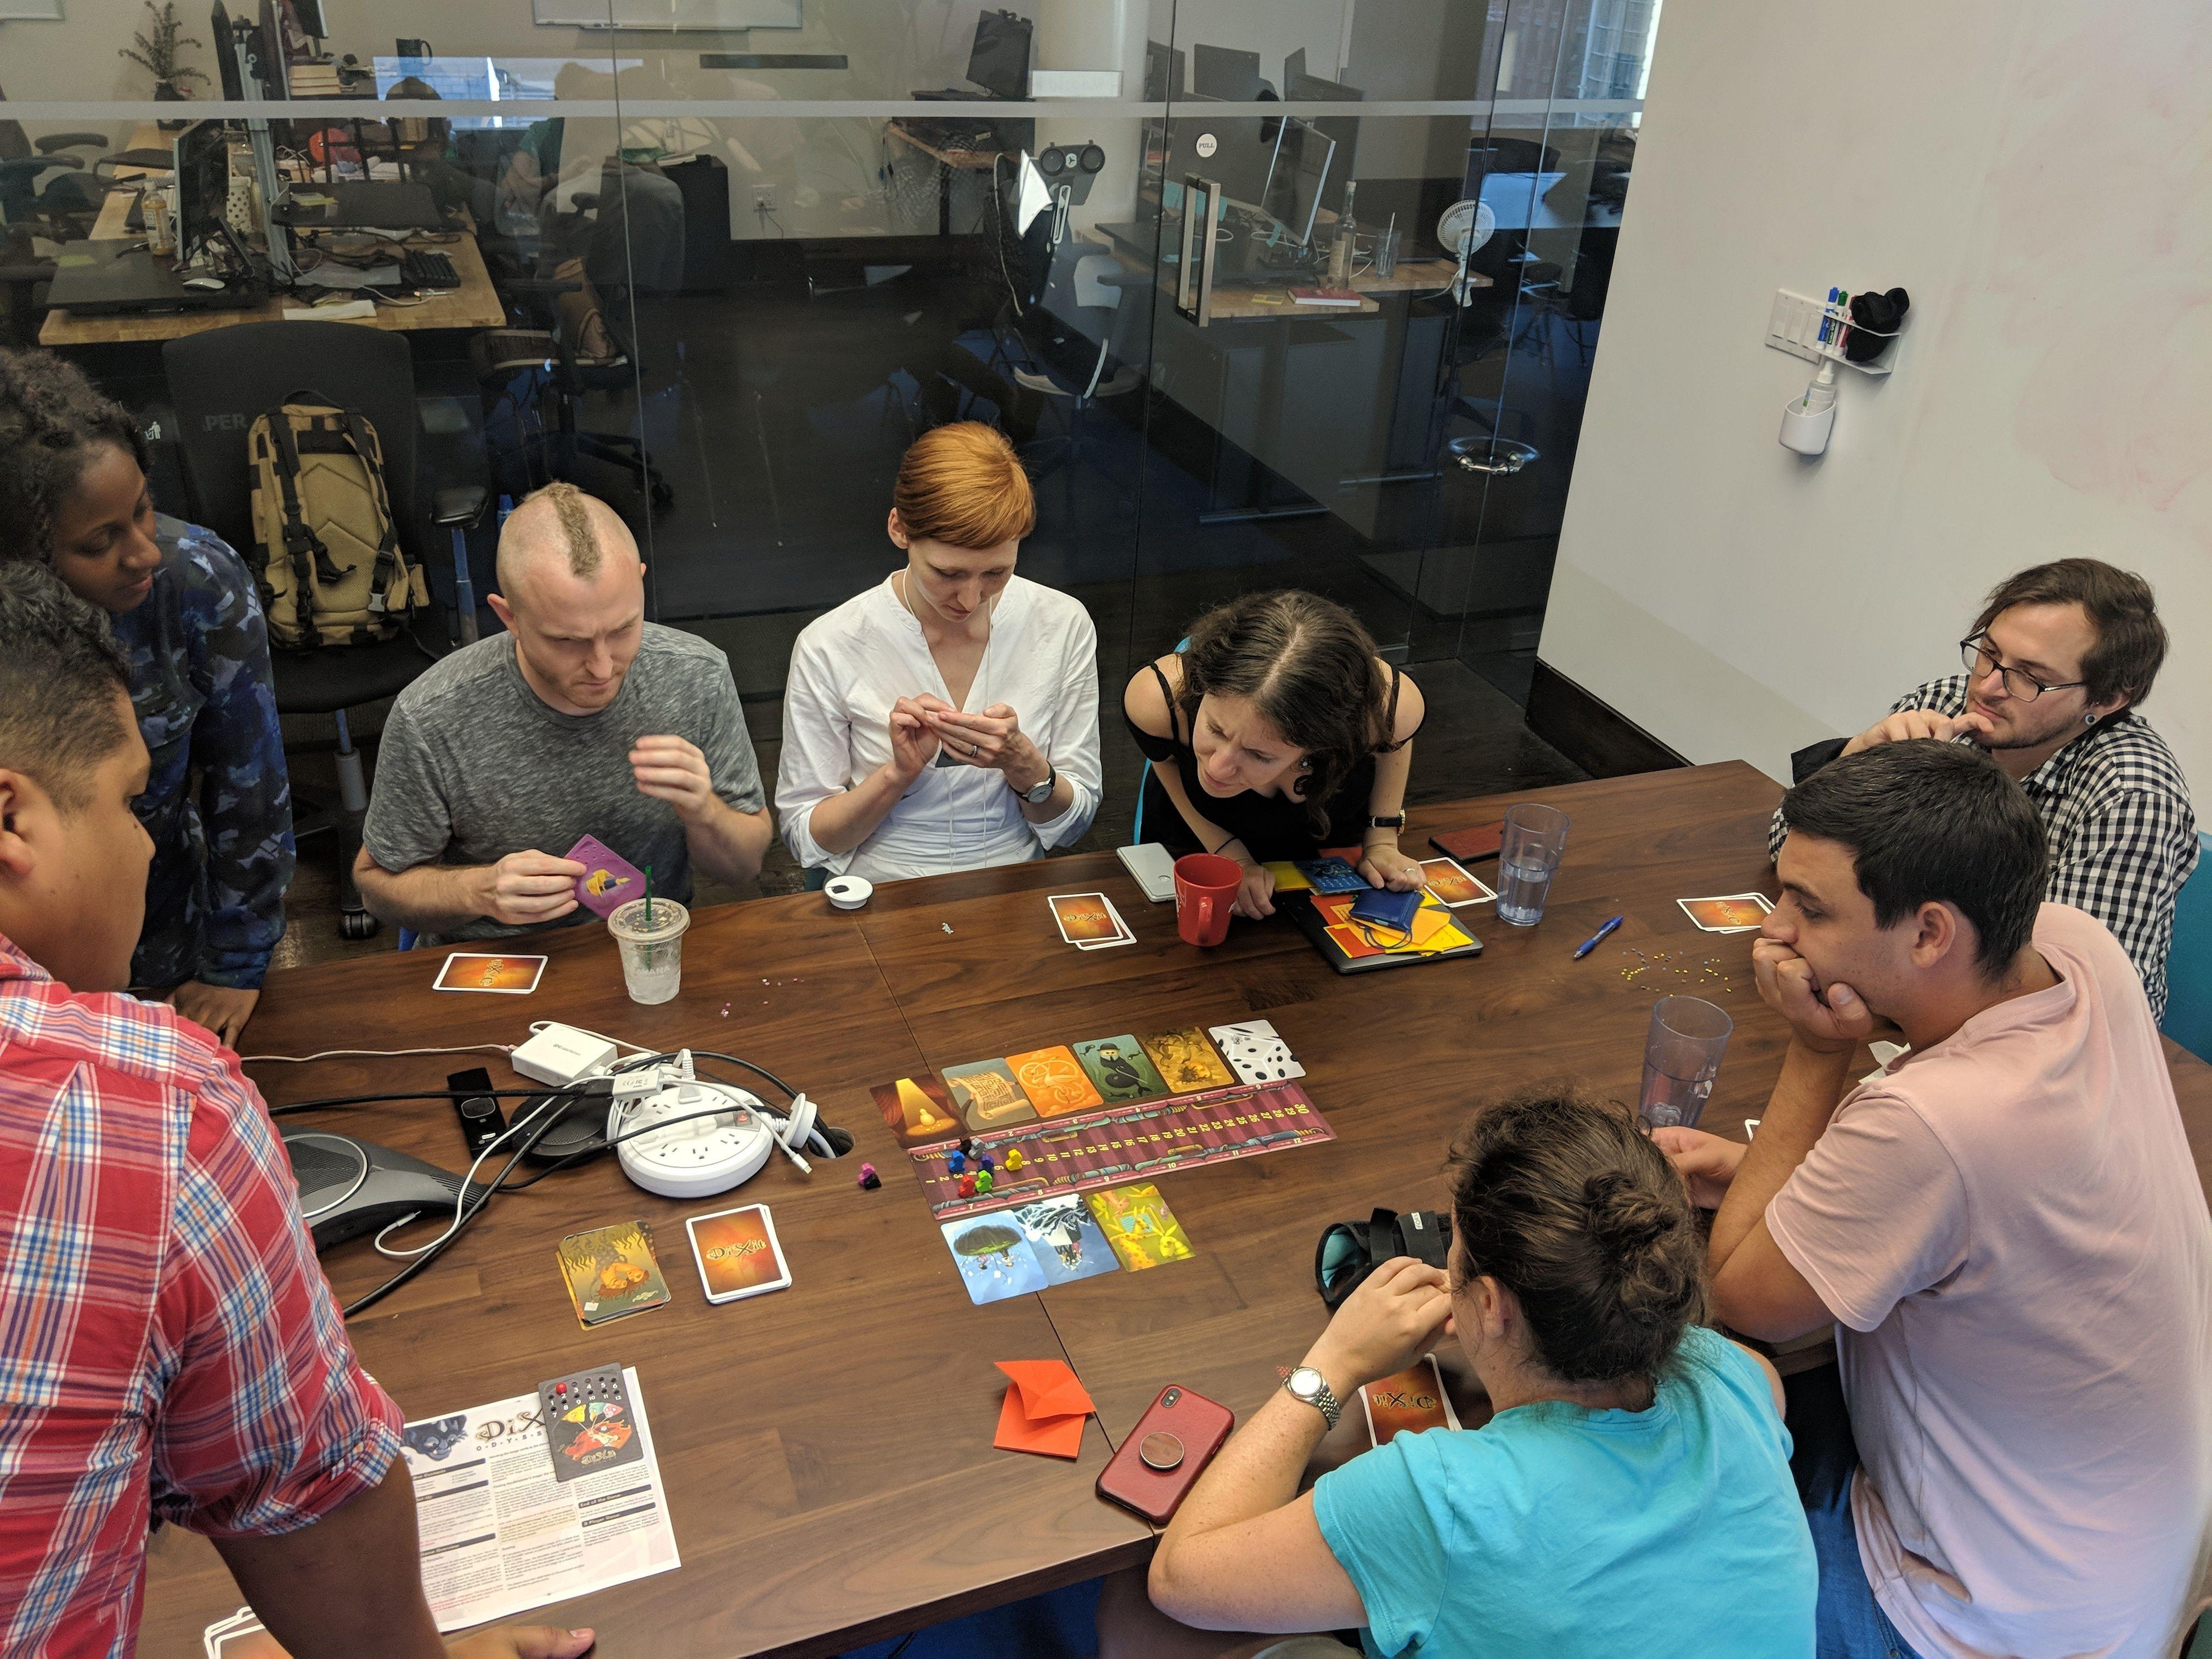 MUG's Game: The 🃏 Meetup 🕹️  Gaming 🎳  Meetup 🎲 Group